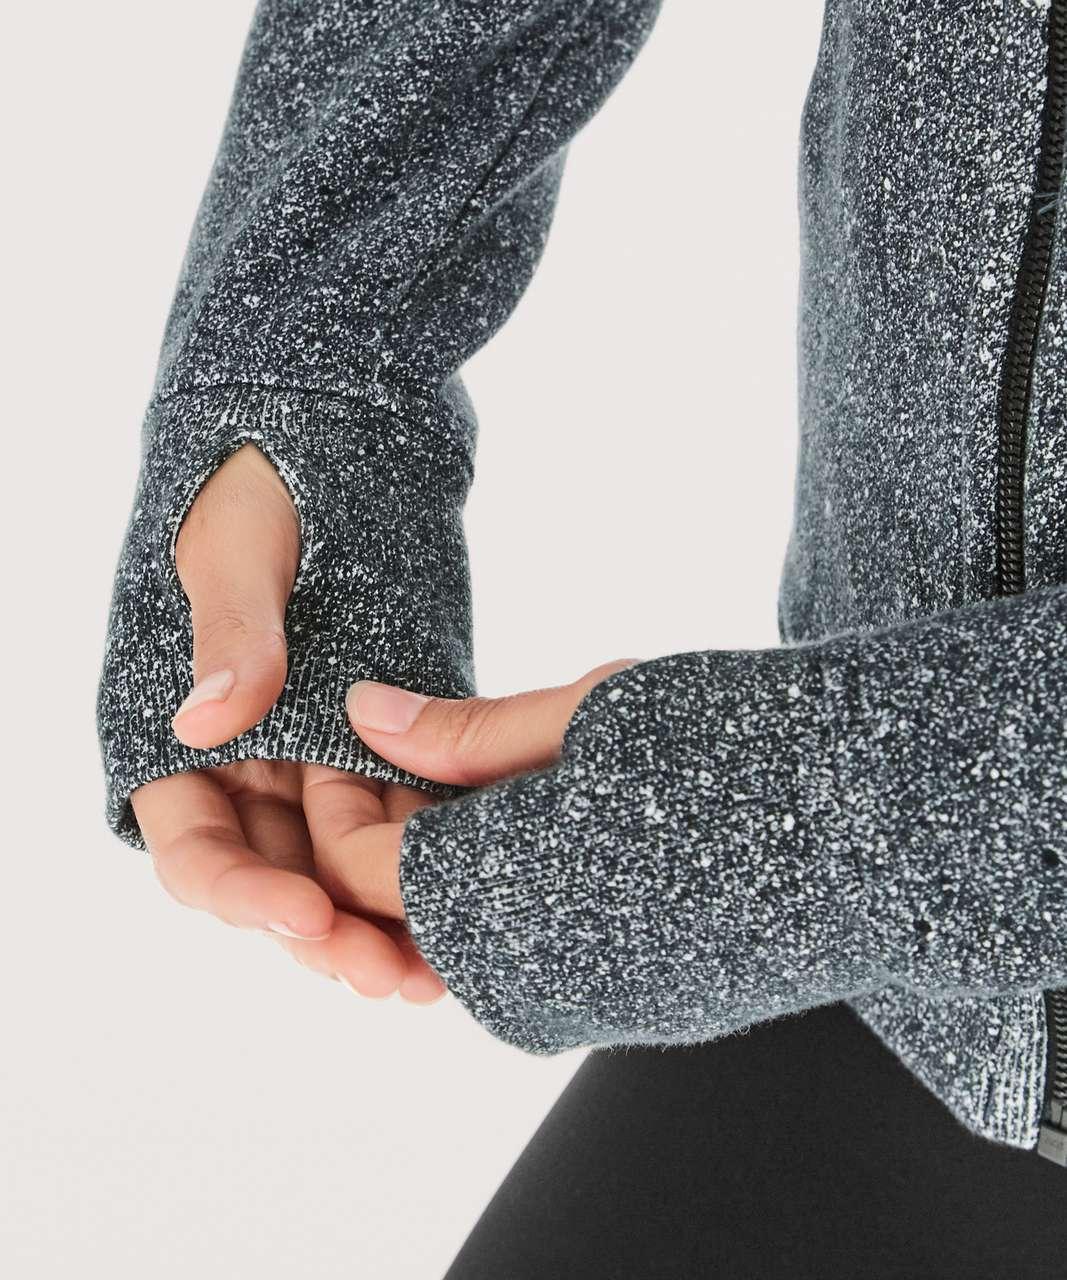 Lululemon Scuba Hoodie *Light Cotton Fleece - Luminesce Splatter White Black (First Release)